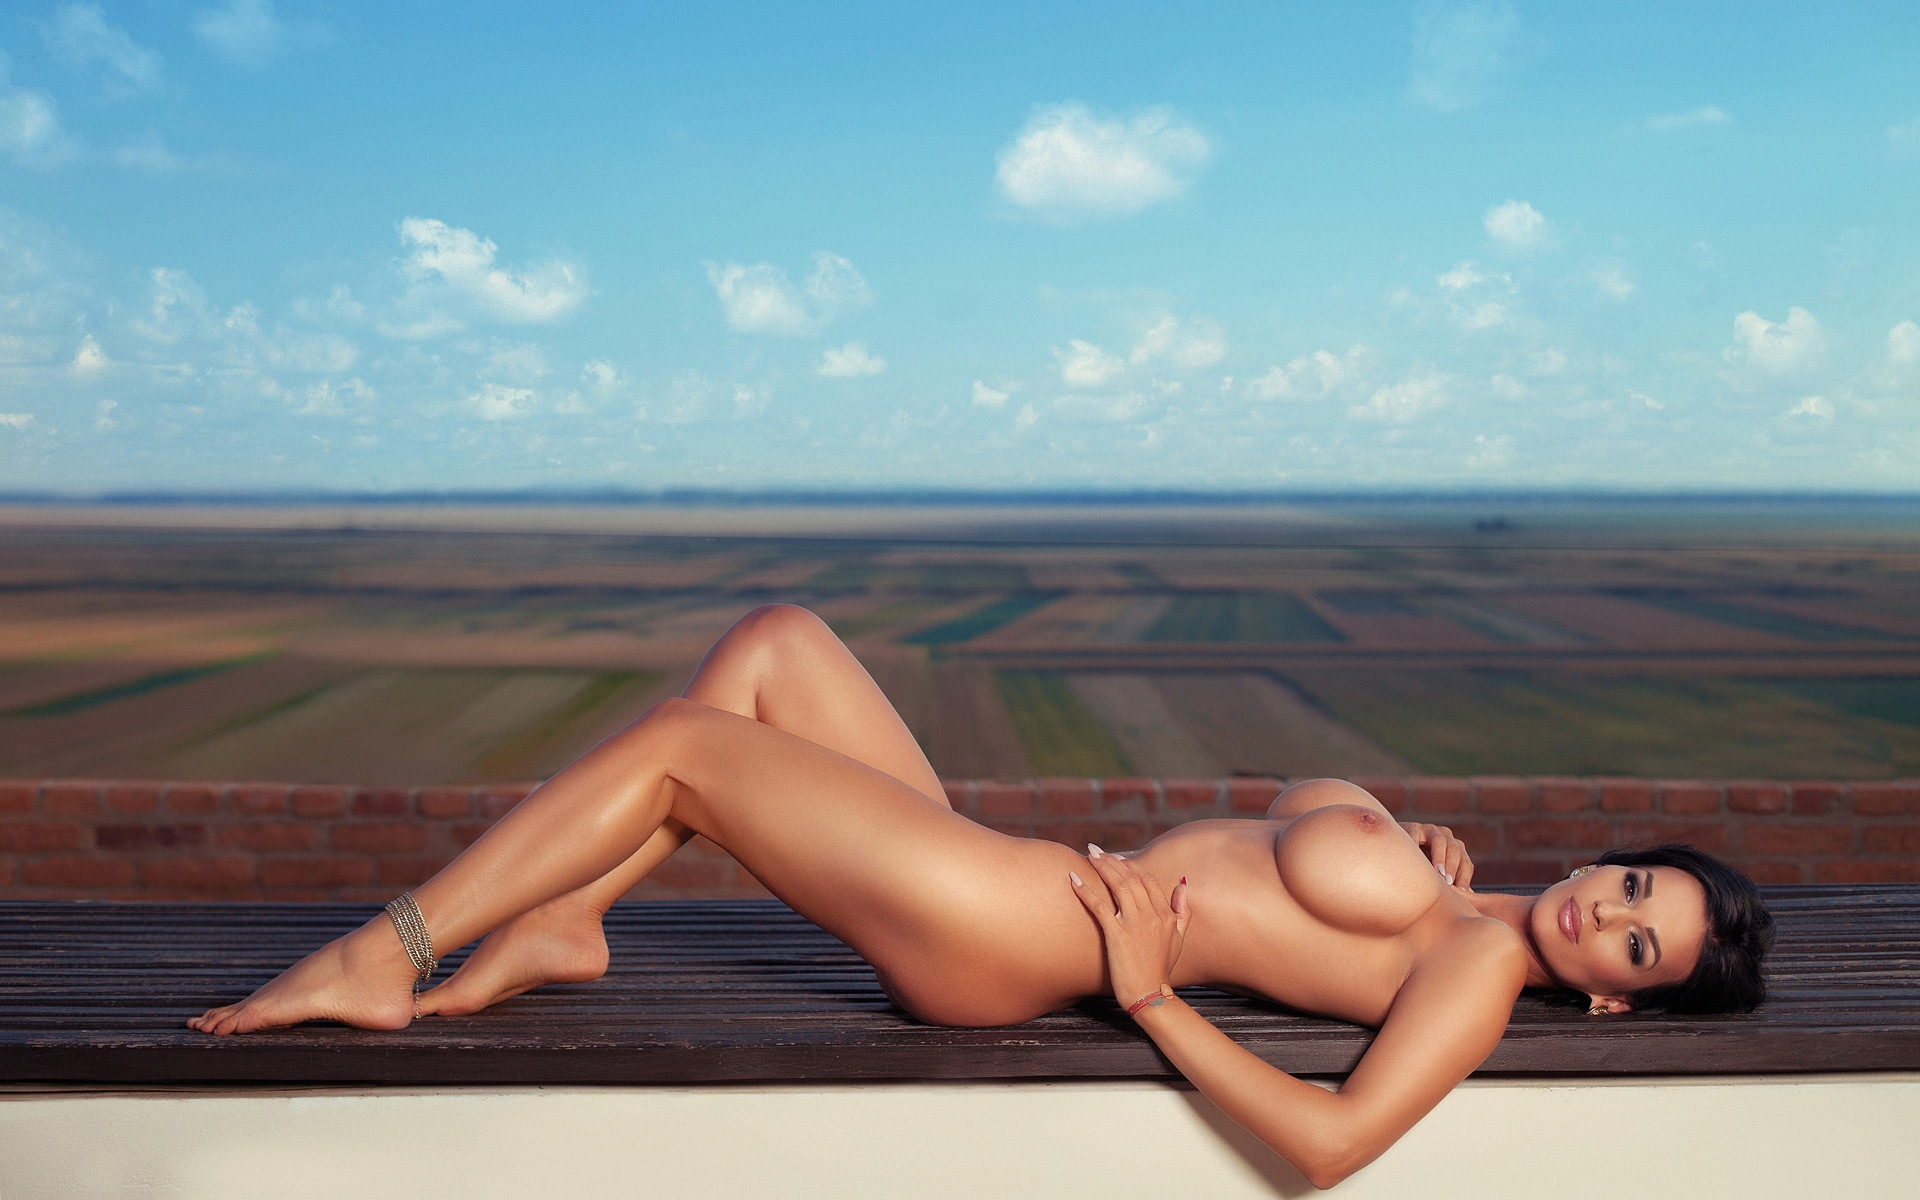 adina barbu busty romanian playmate nude on a balcony outdoors erotic